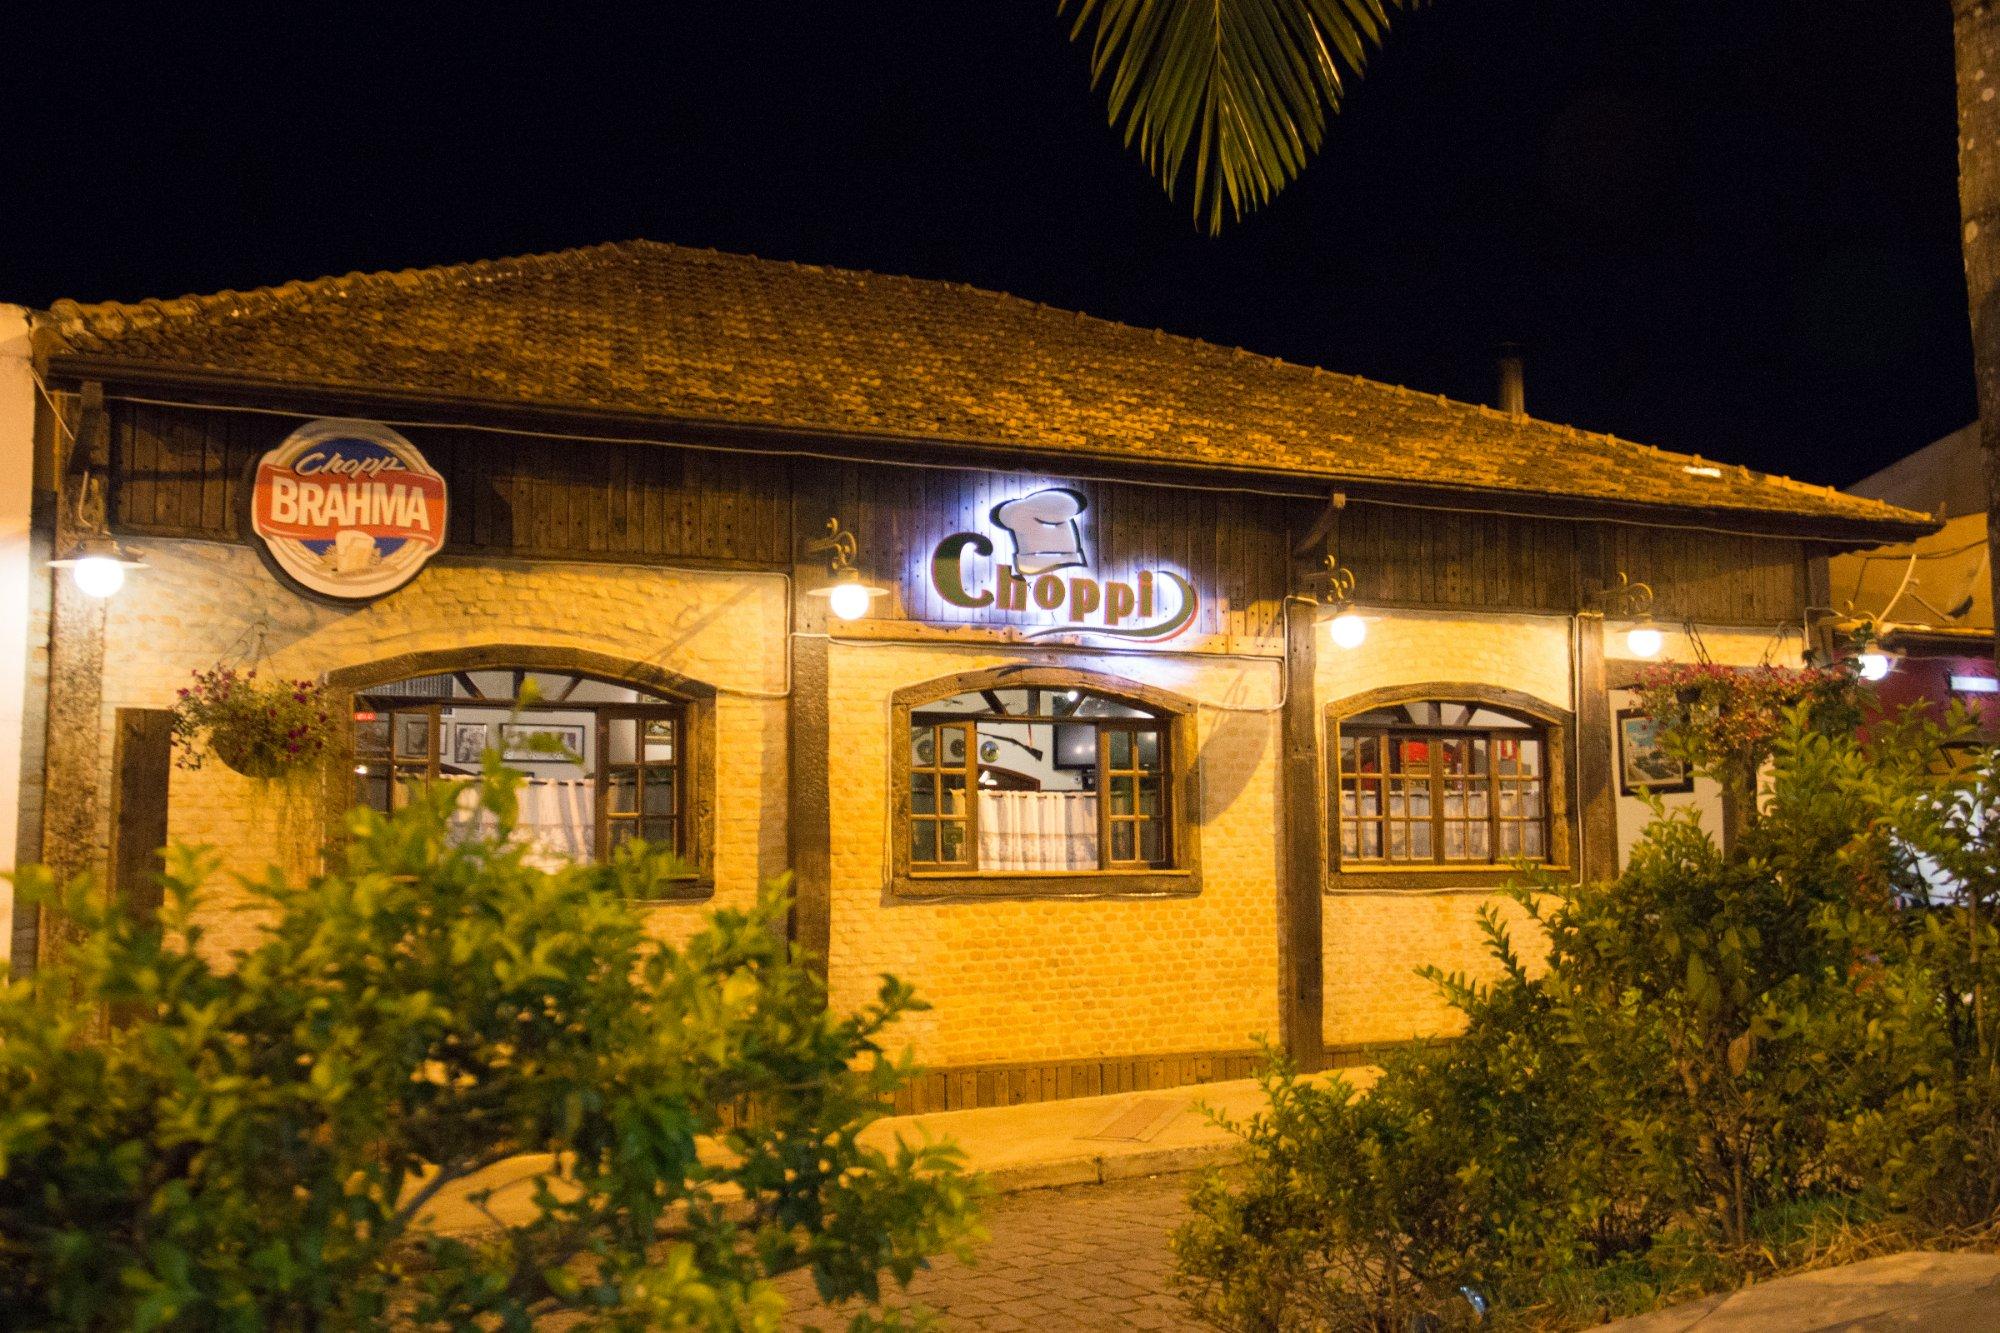 Most Popular South American food in Santa Branca, State of Sao Paulo, Brazil